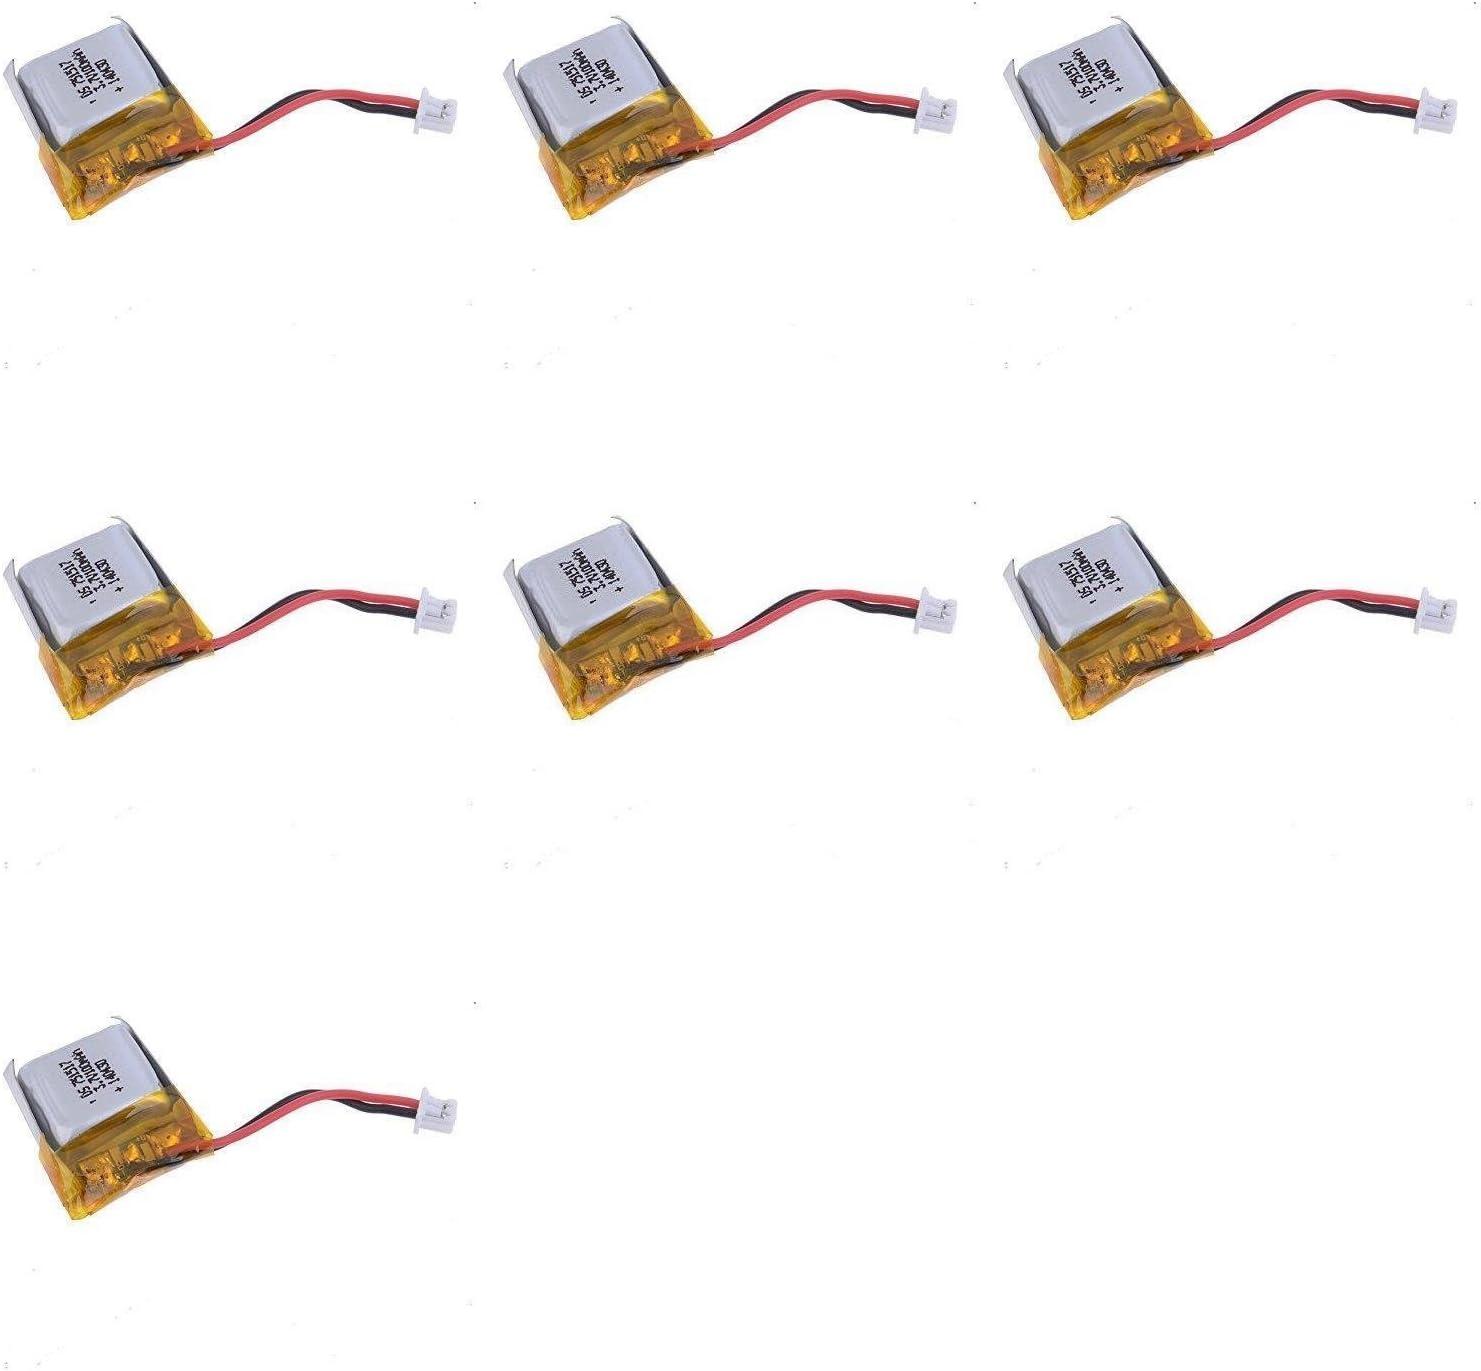 7 x Quantity of Estes Proto-X Li-Po Battery Power Pack 3.7v 100mAh: Amazon.es: Hogar